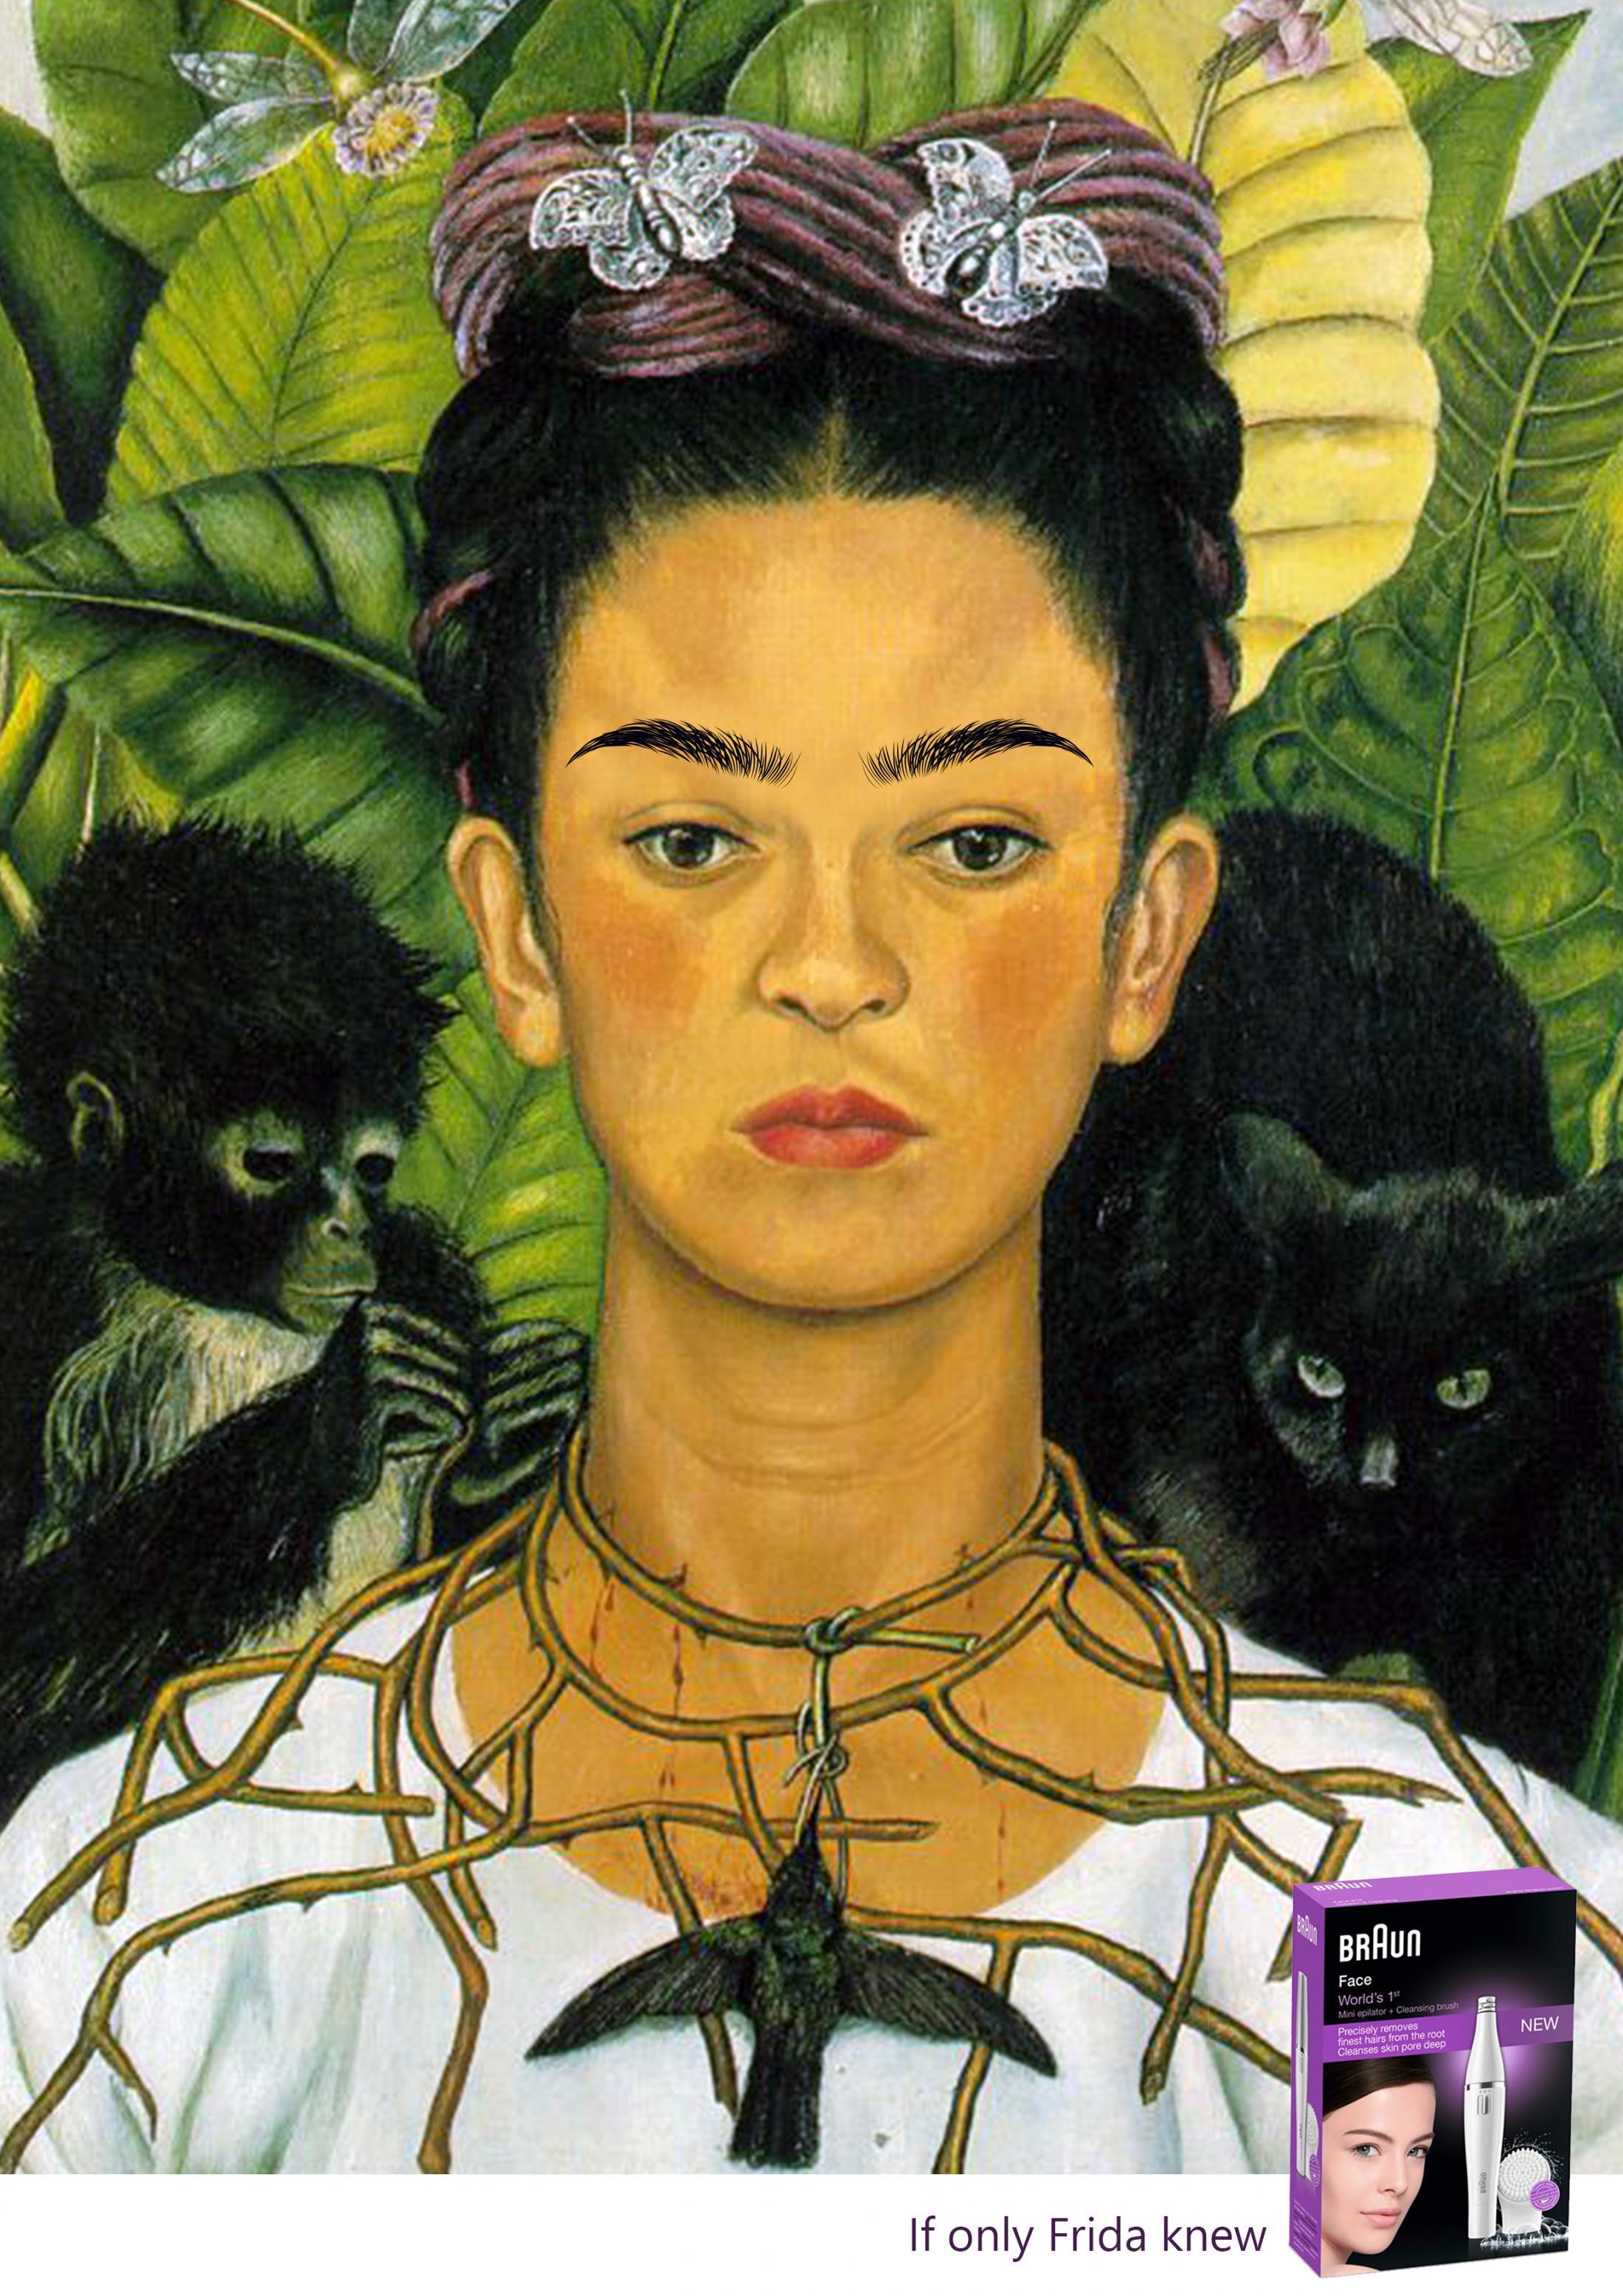 Braun Print Ad - Frida, 1